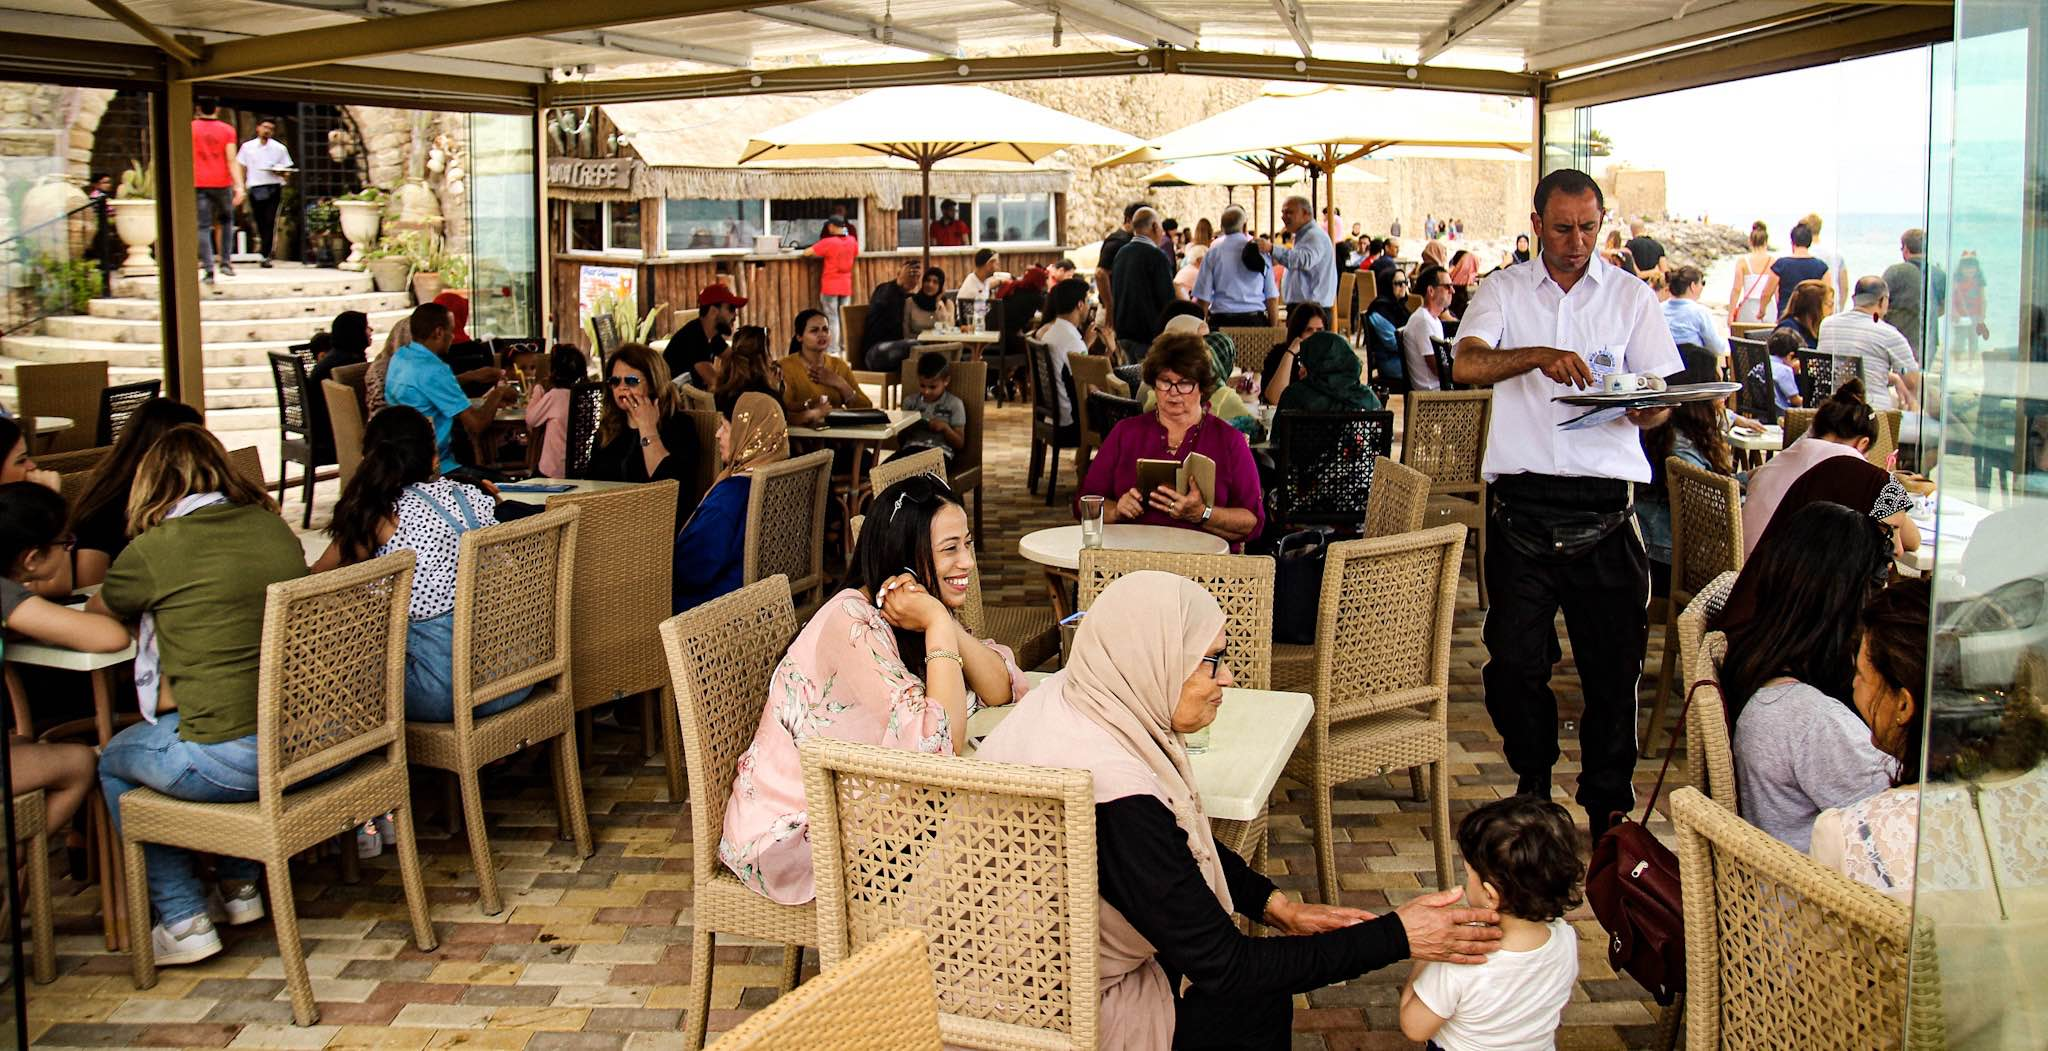 Hammamet, Tunisia cafe scene